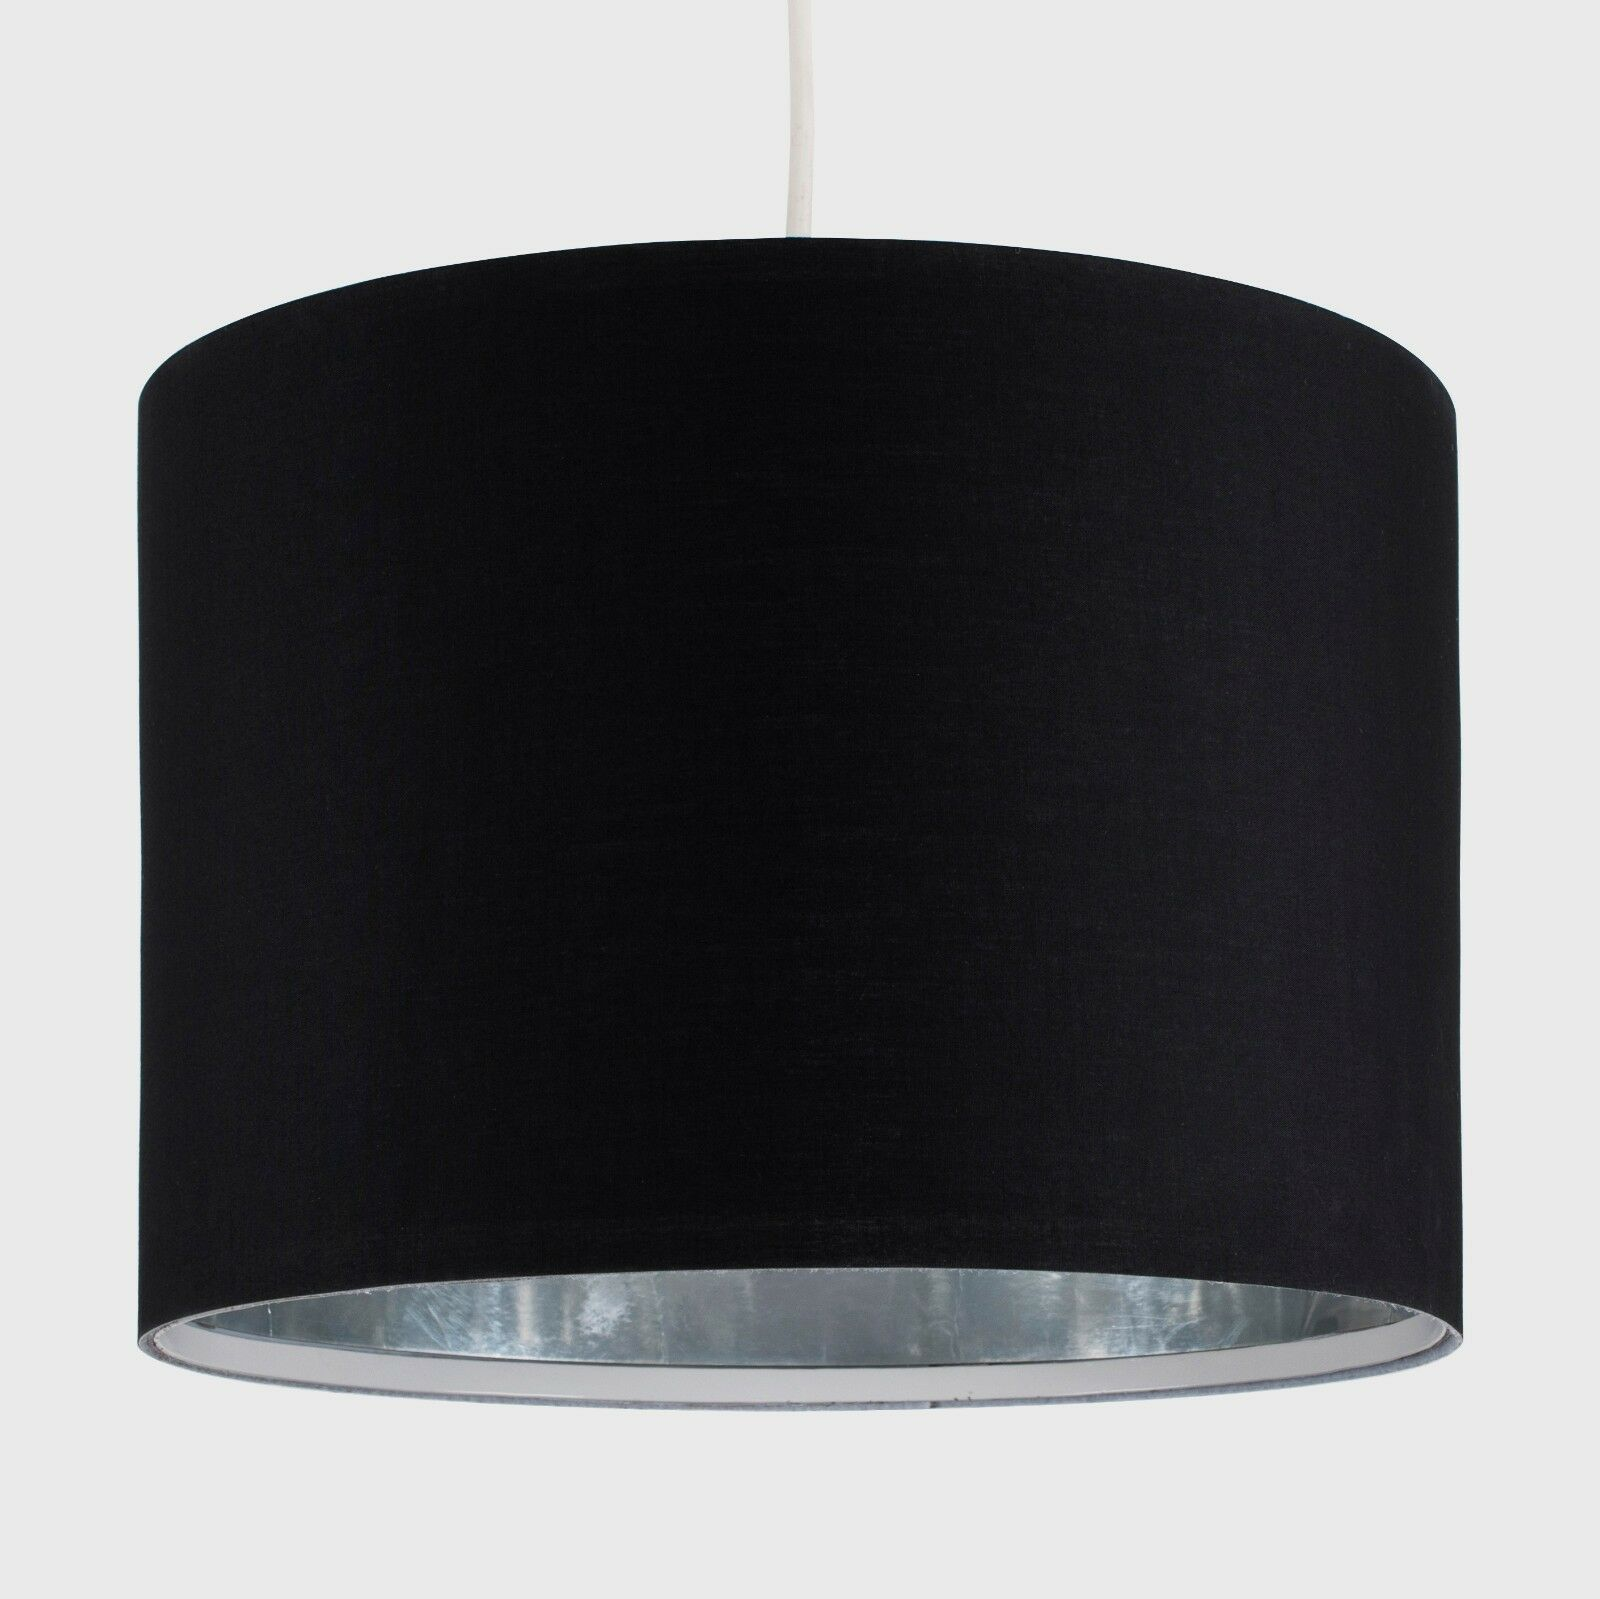 Tela-moderna-algodon-facil-ajuste-Techo-Colgante-Pantalla-De-Mesa-tonos-de-luz-de-tambor miniatura 23